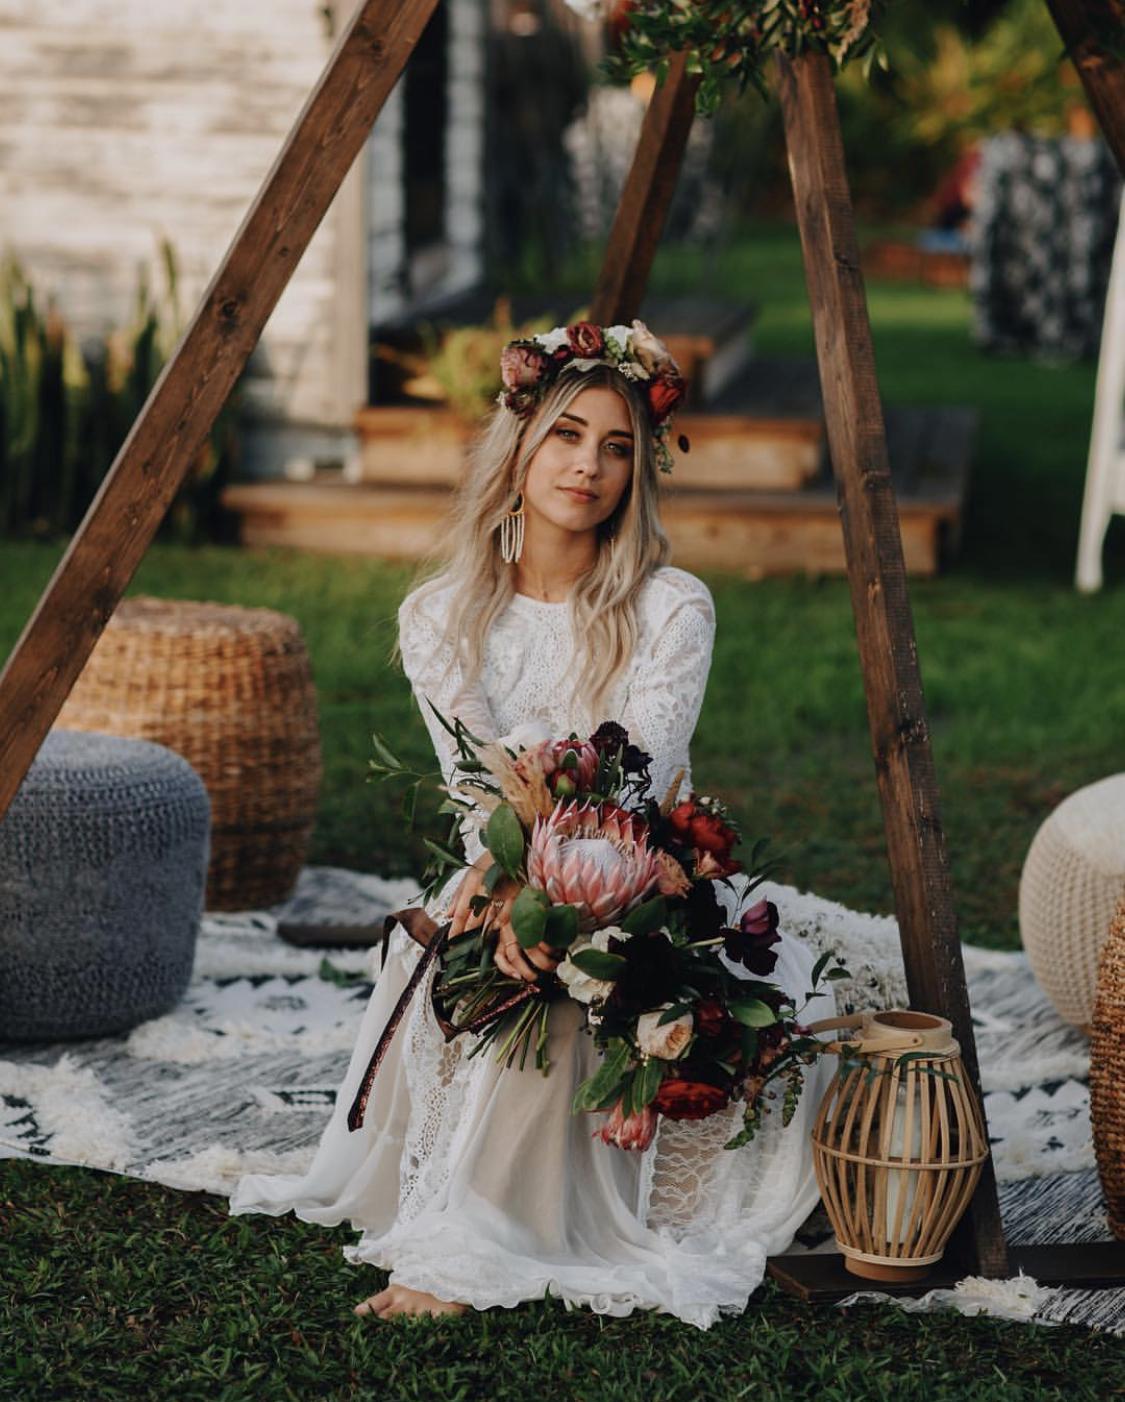 Ashton Events - Darling Juliet Photography2.jpg